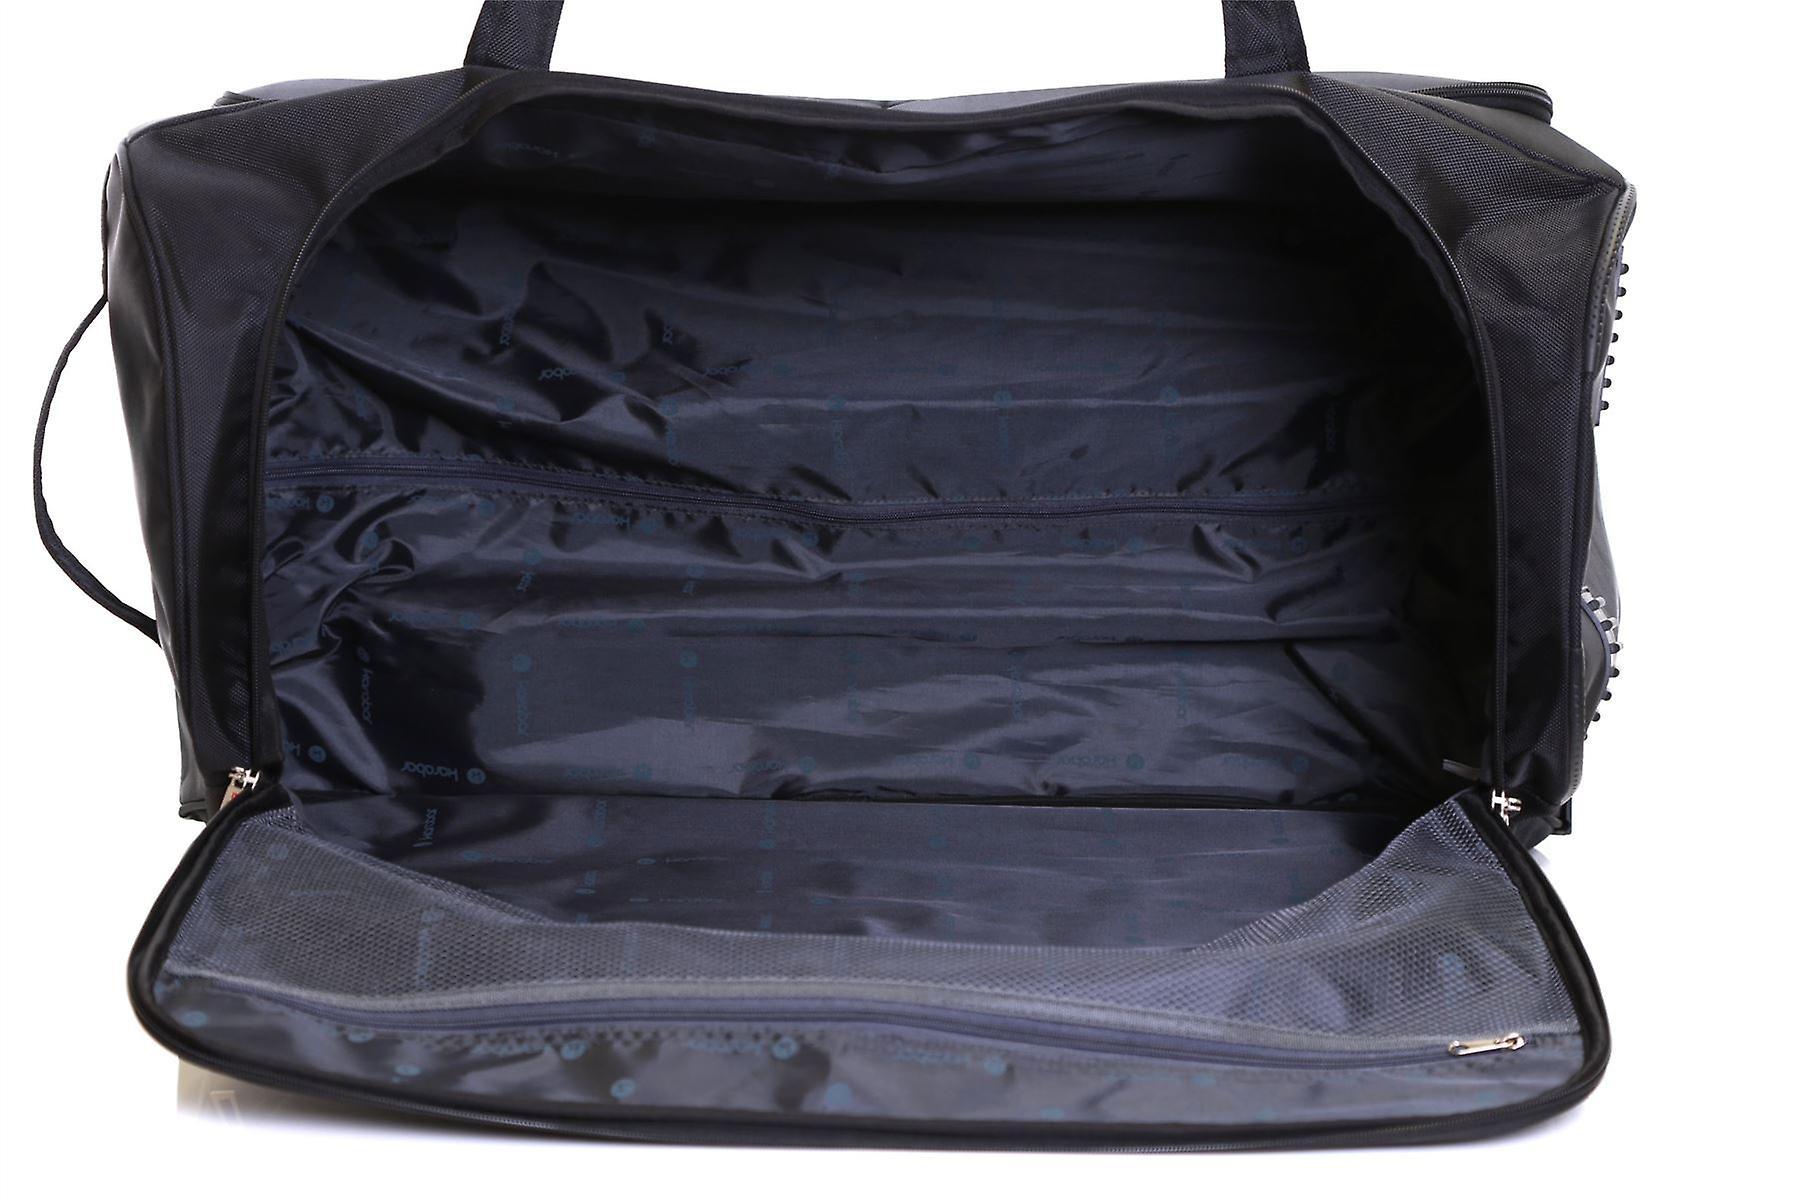 Karabar Montoro 34 Inch Wheeled Bag, Black